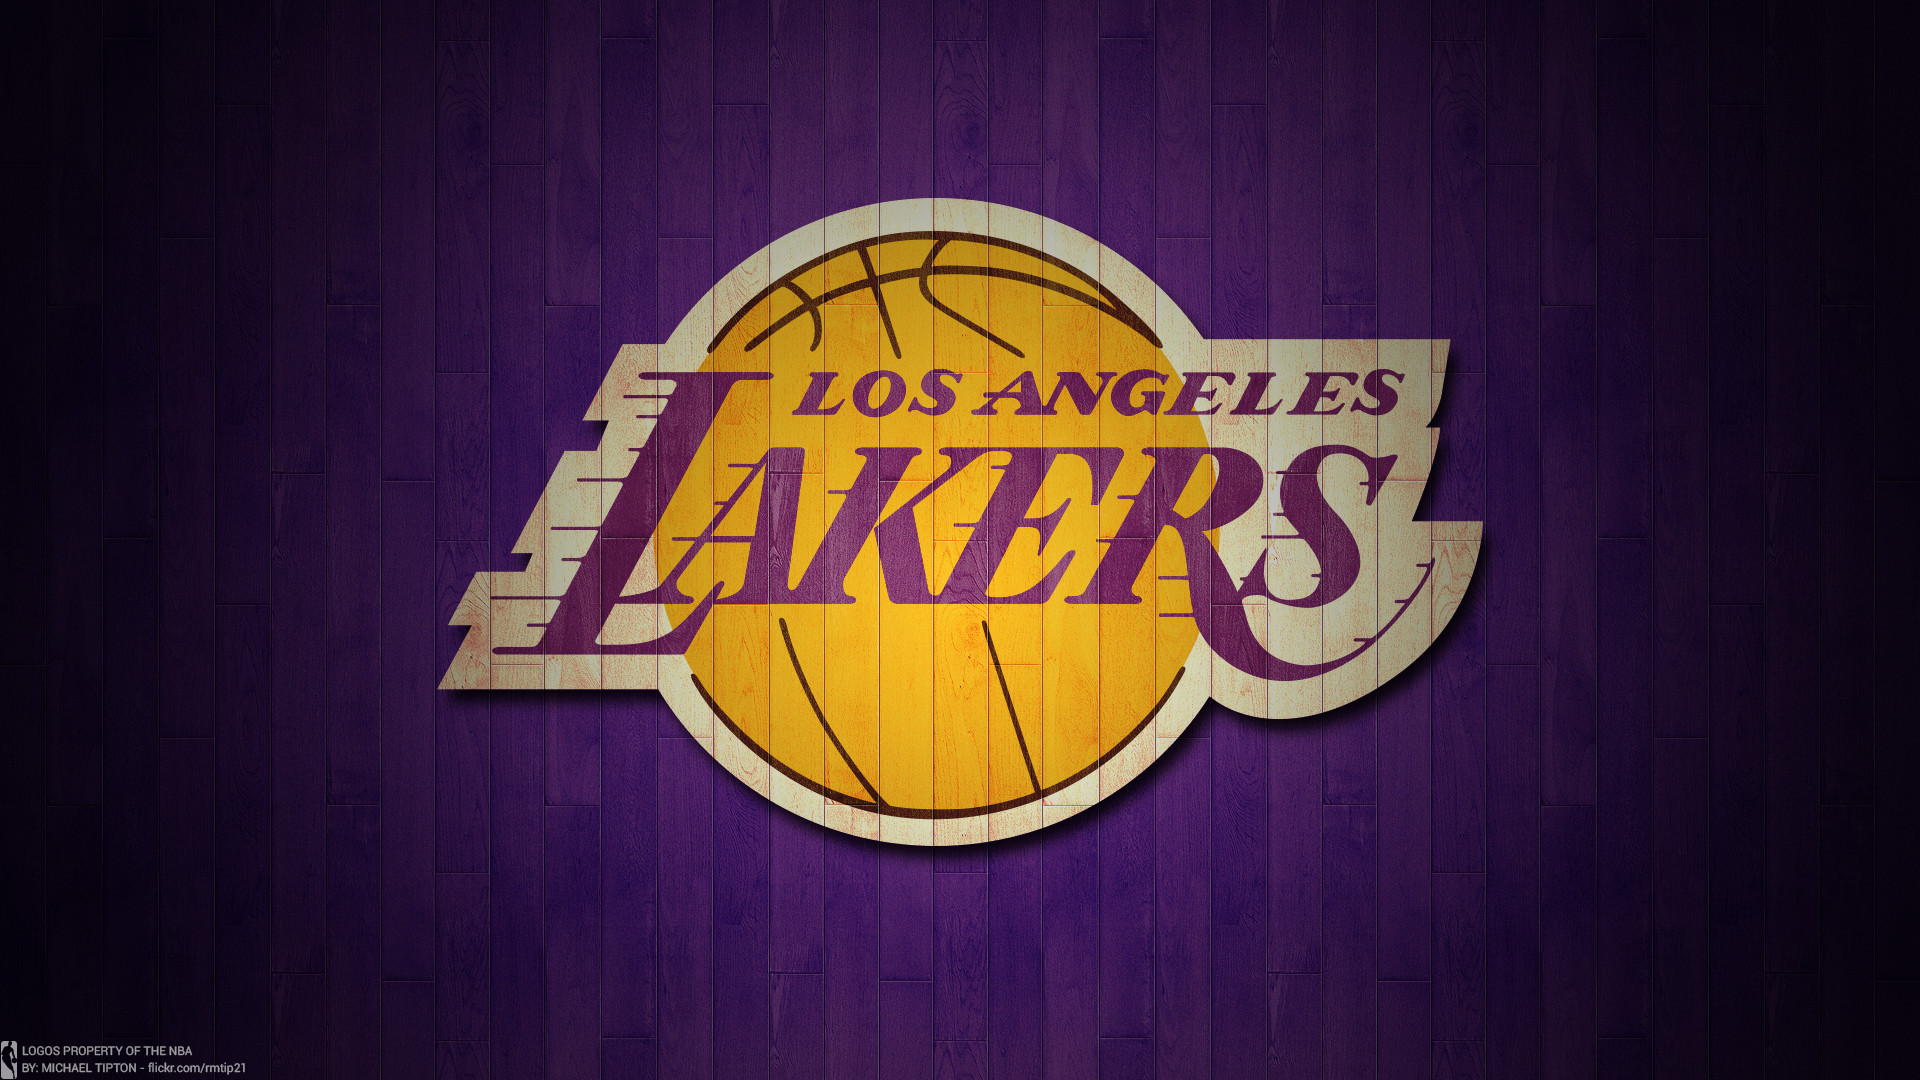 los angeles lakers 2017 nba basketball hardwood logo wallpaper free pc  desktop computer hd …